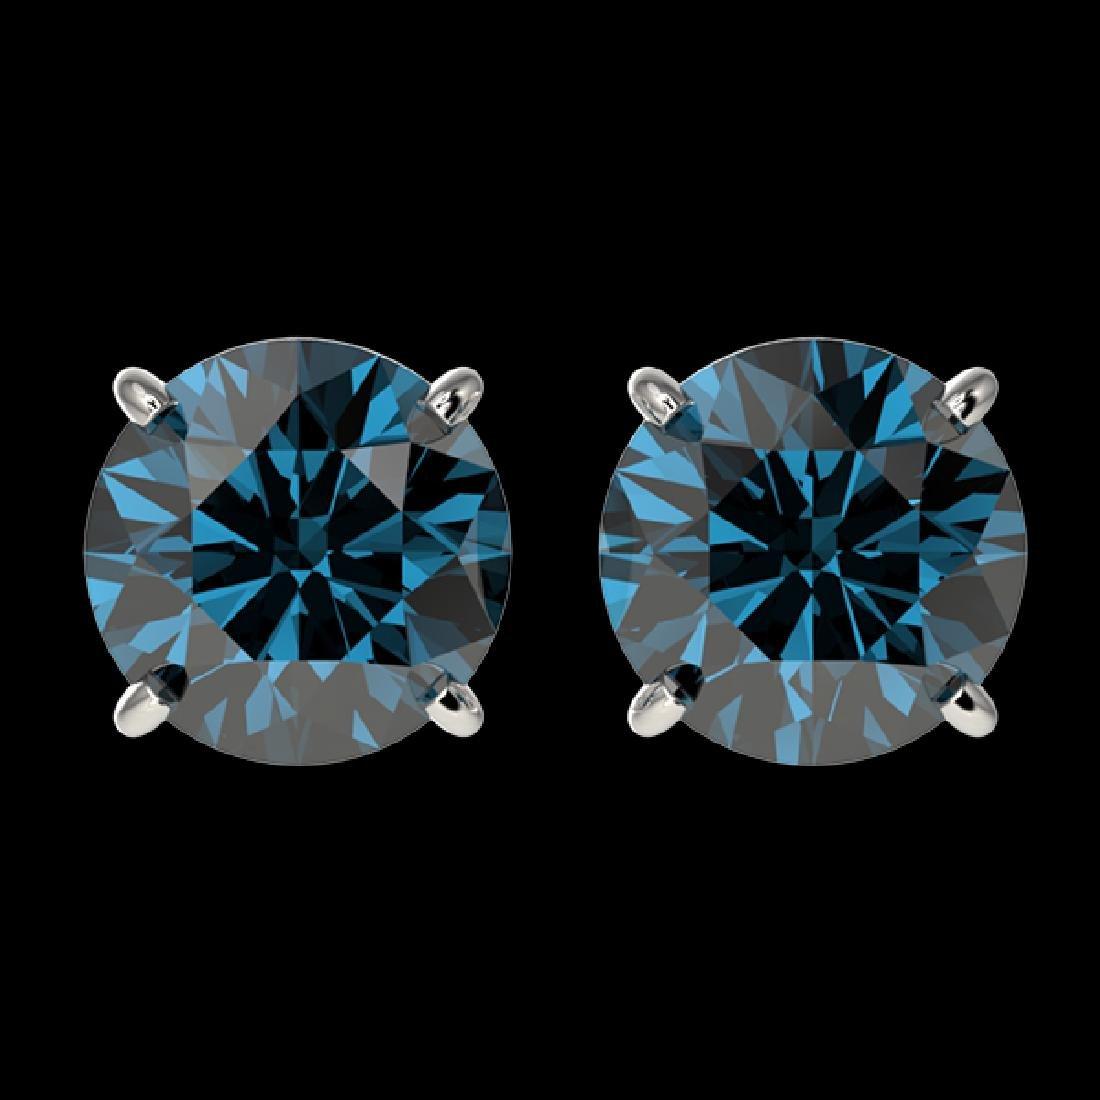 2 CTW Certified Intense Blue SI Diamond Solitaire Stud